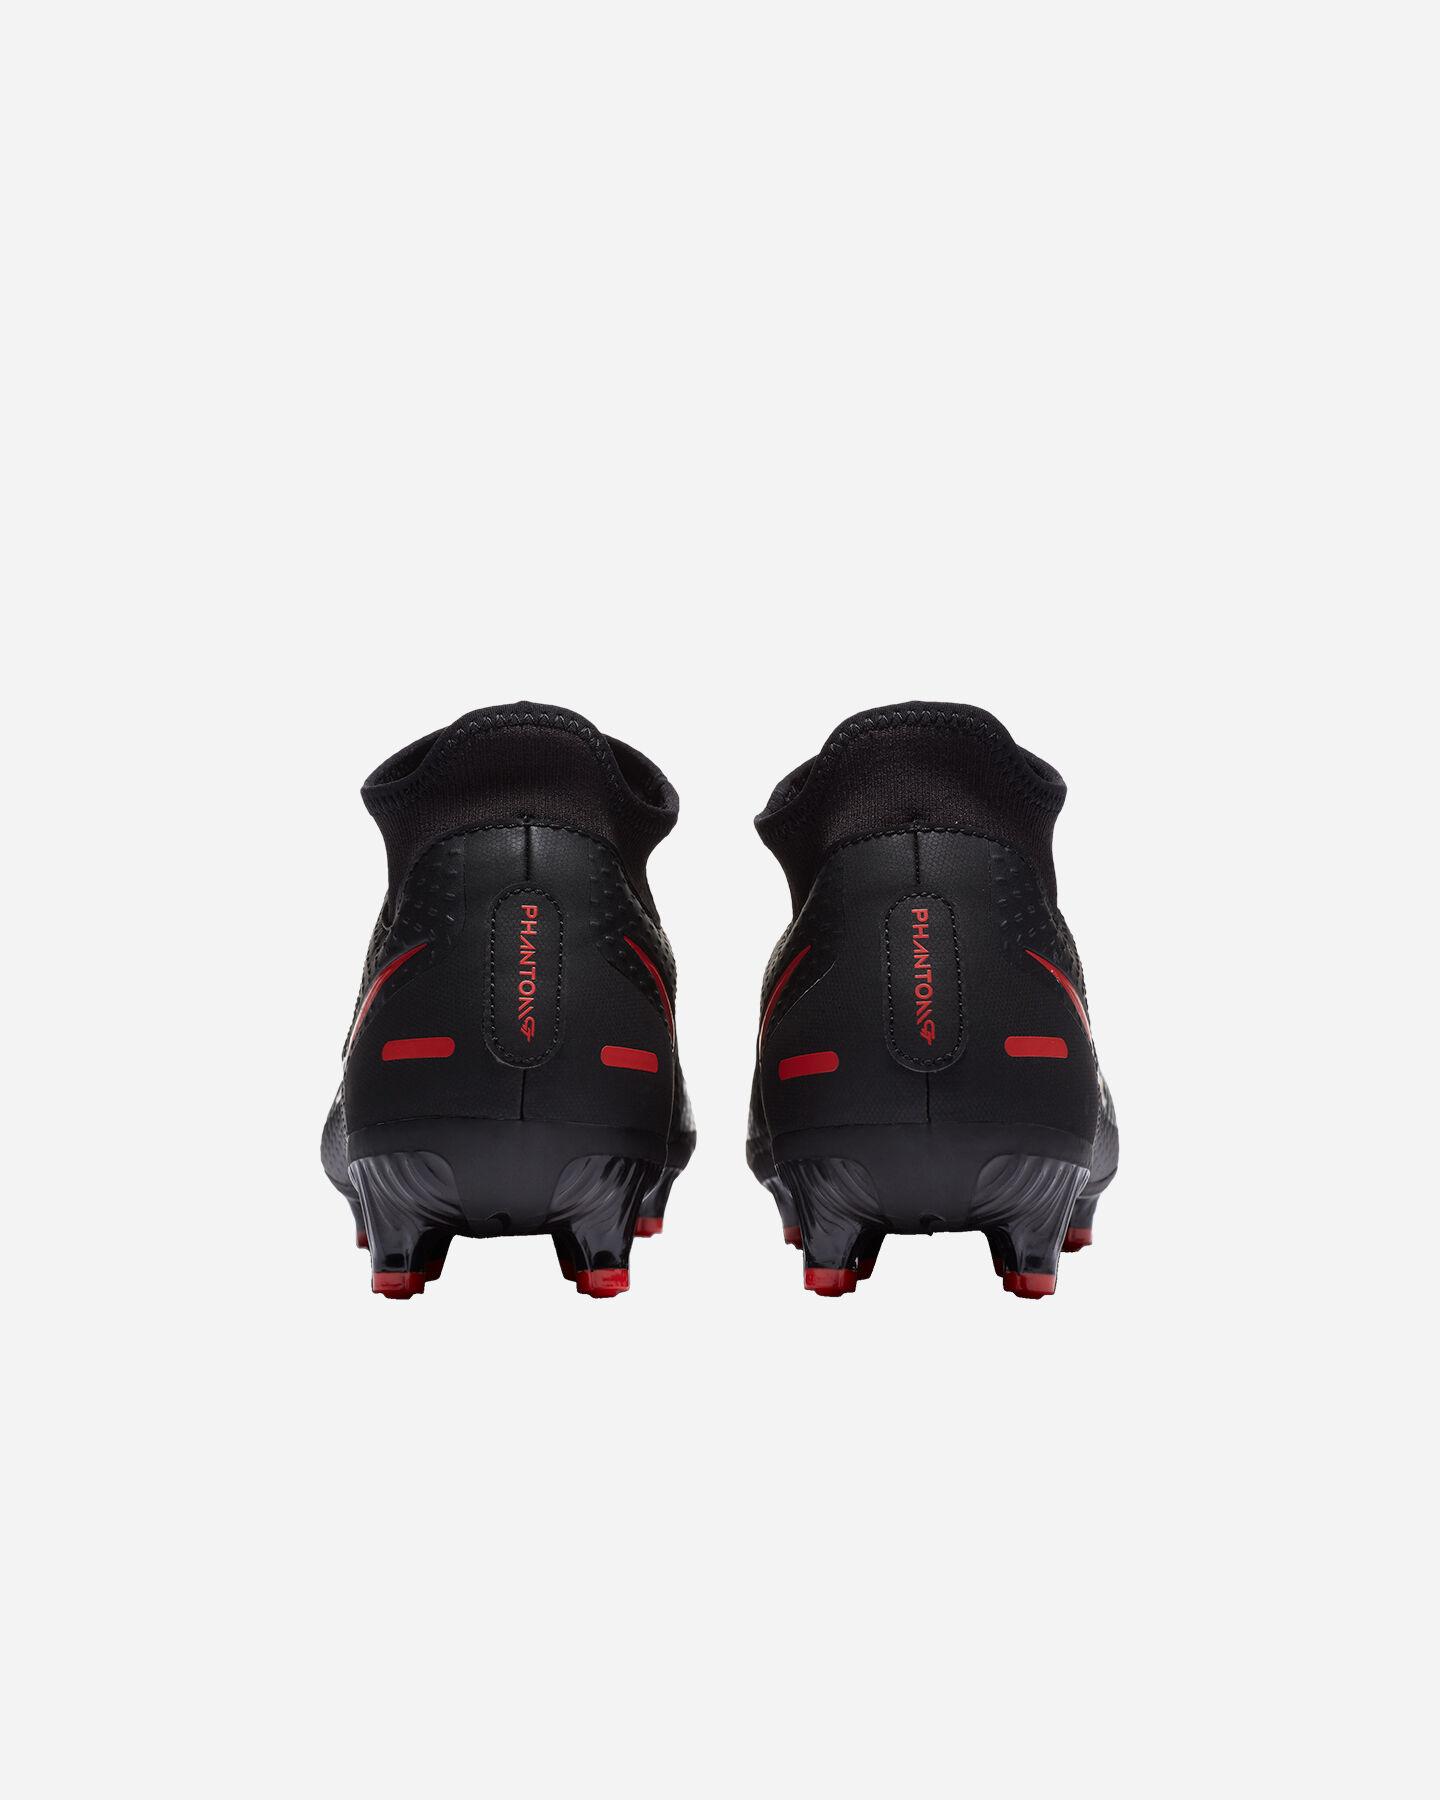 Scarpe calcio NIKE PHANTOM GT ACADEMY DYNAMIC FIT FG/MG M S5224289 scatto 4